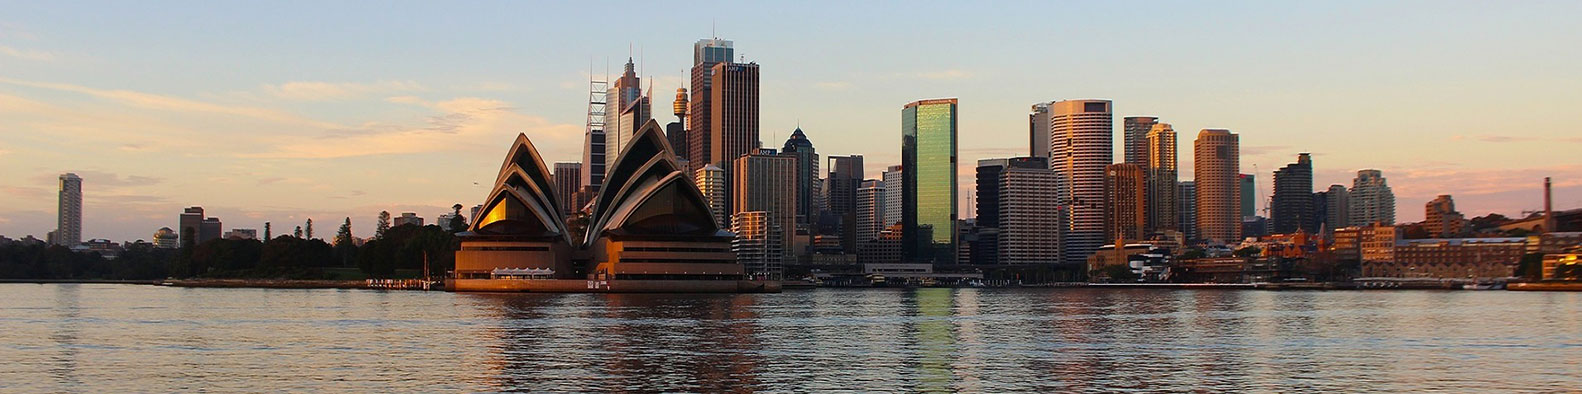 AICR Australia